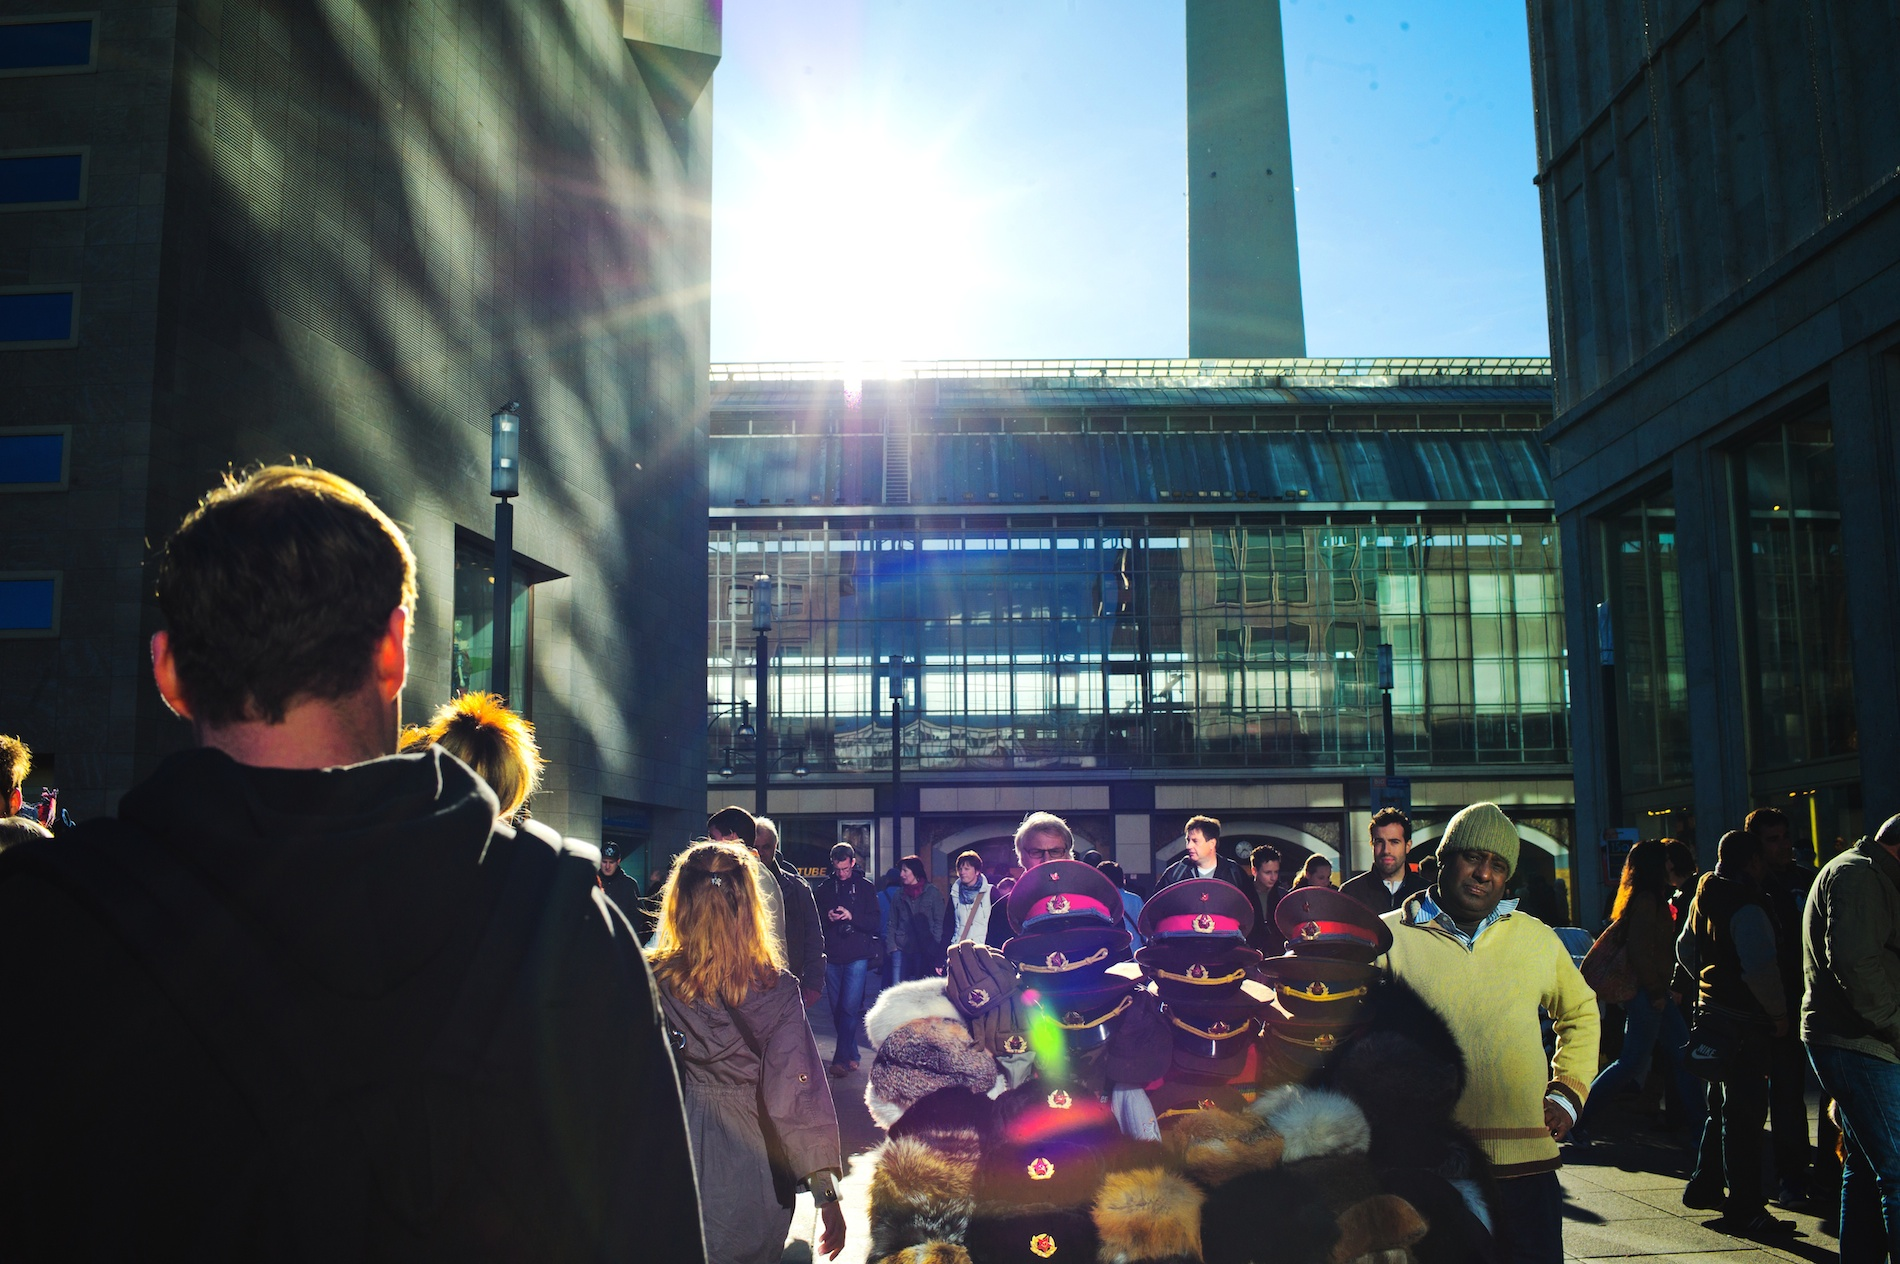 2011-10-15 at 15-31-50, street.jpg